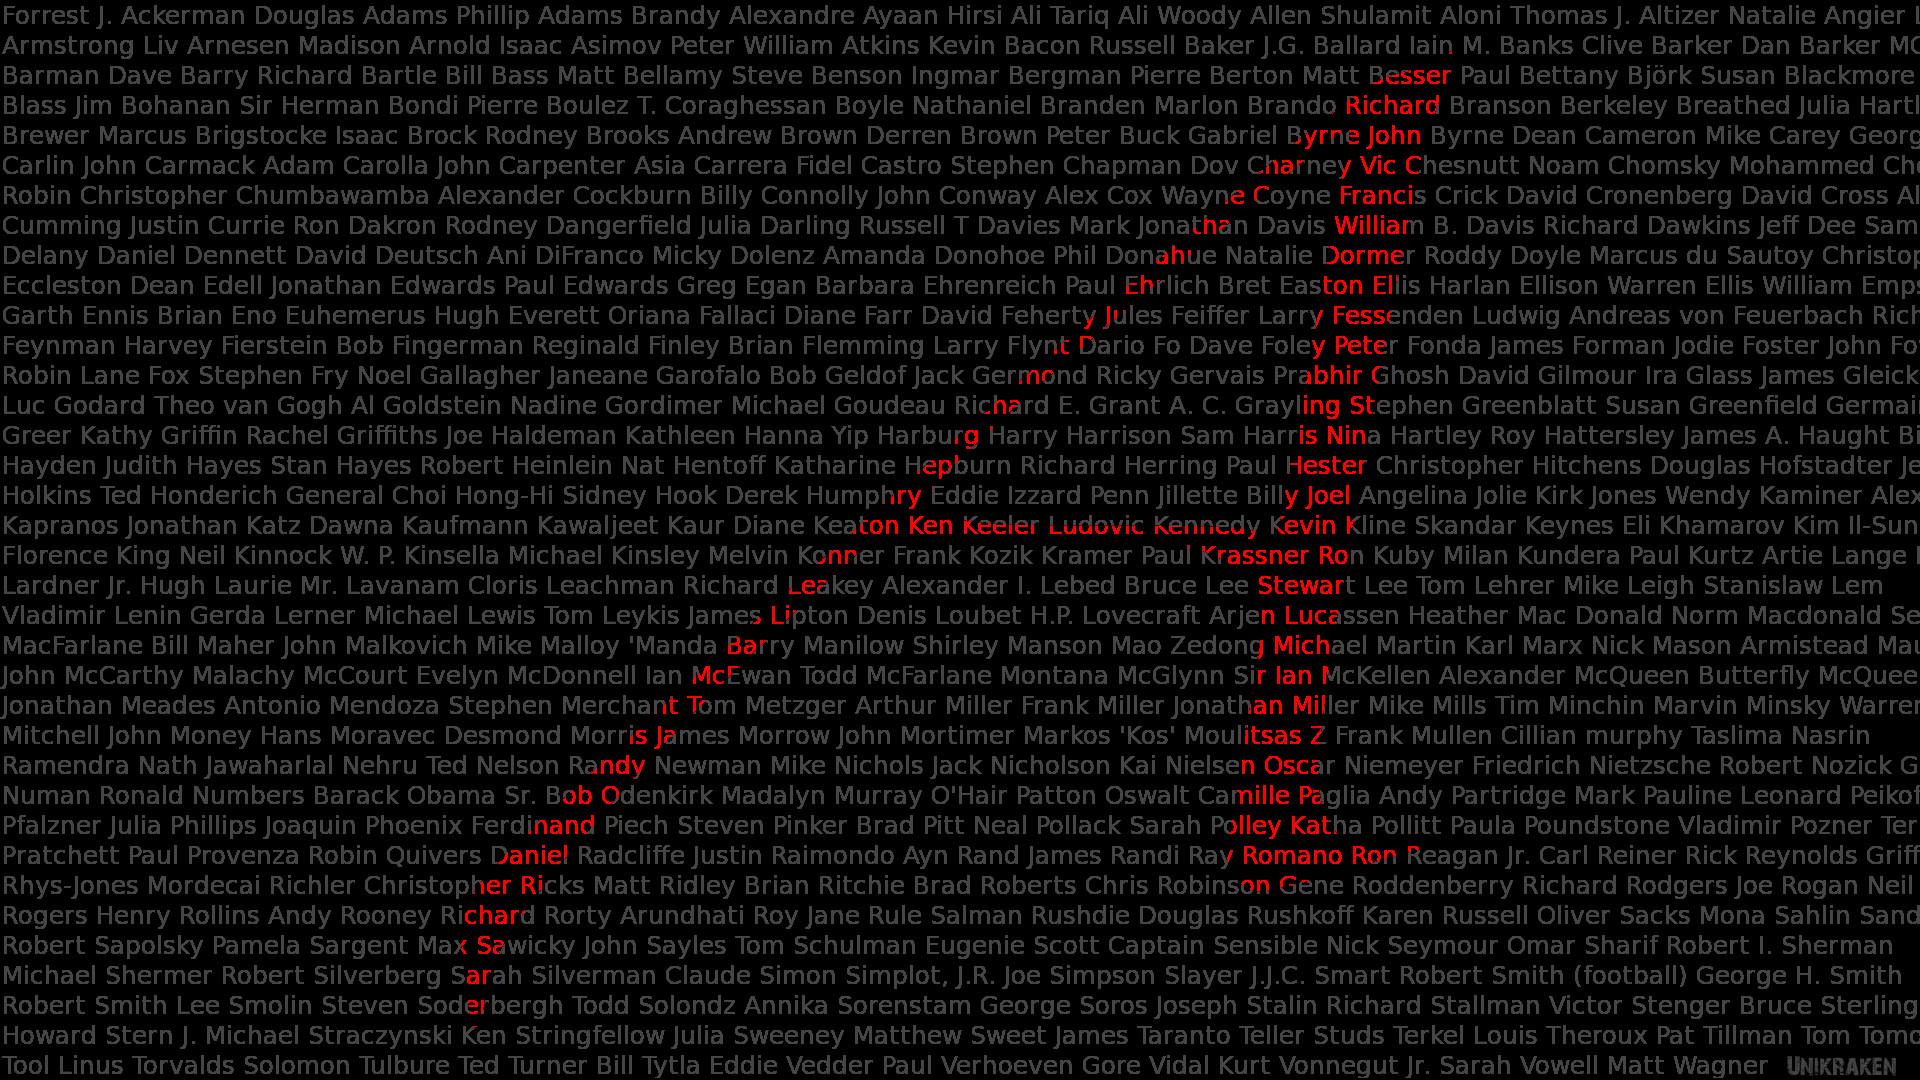 Kingdom hearts symbols wallpaper 71 images 1920x1080 voltagebd Choice Image